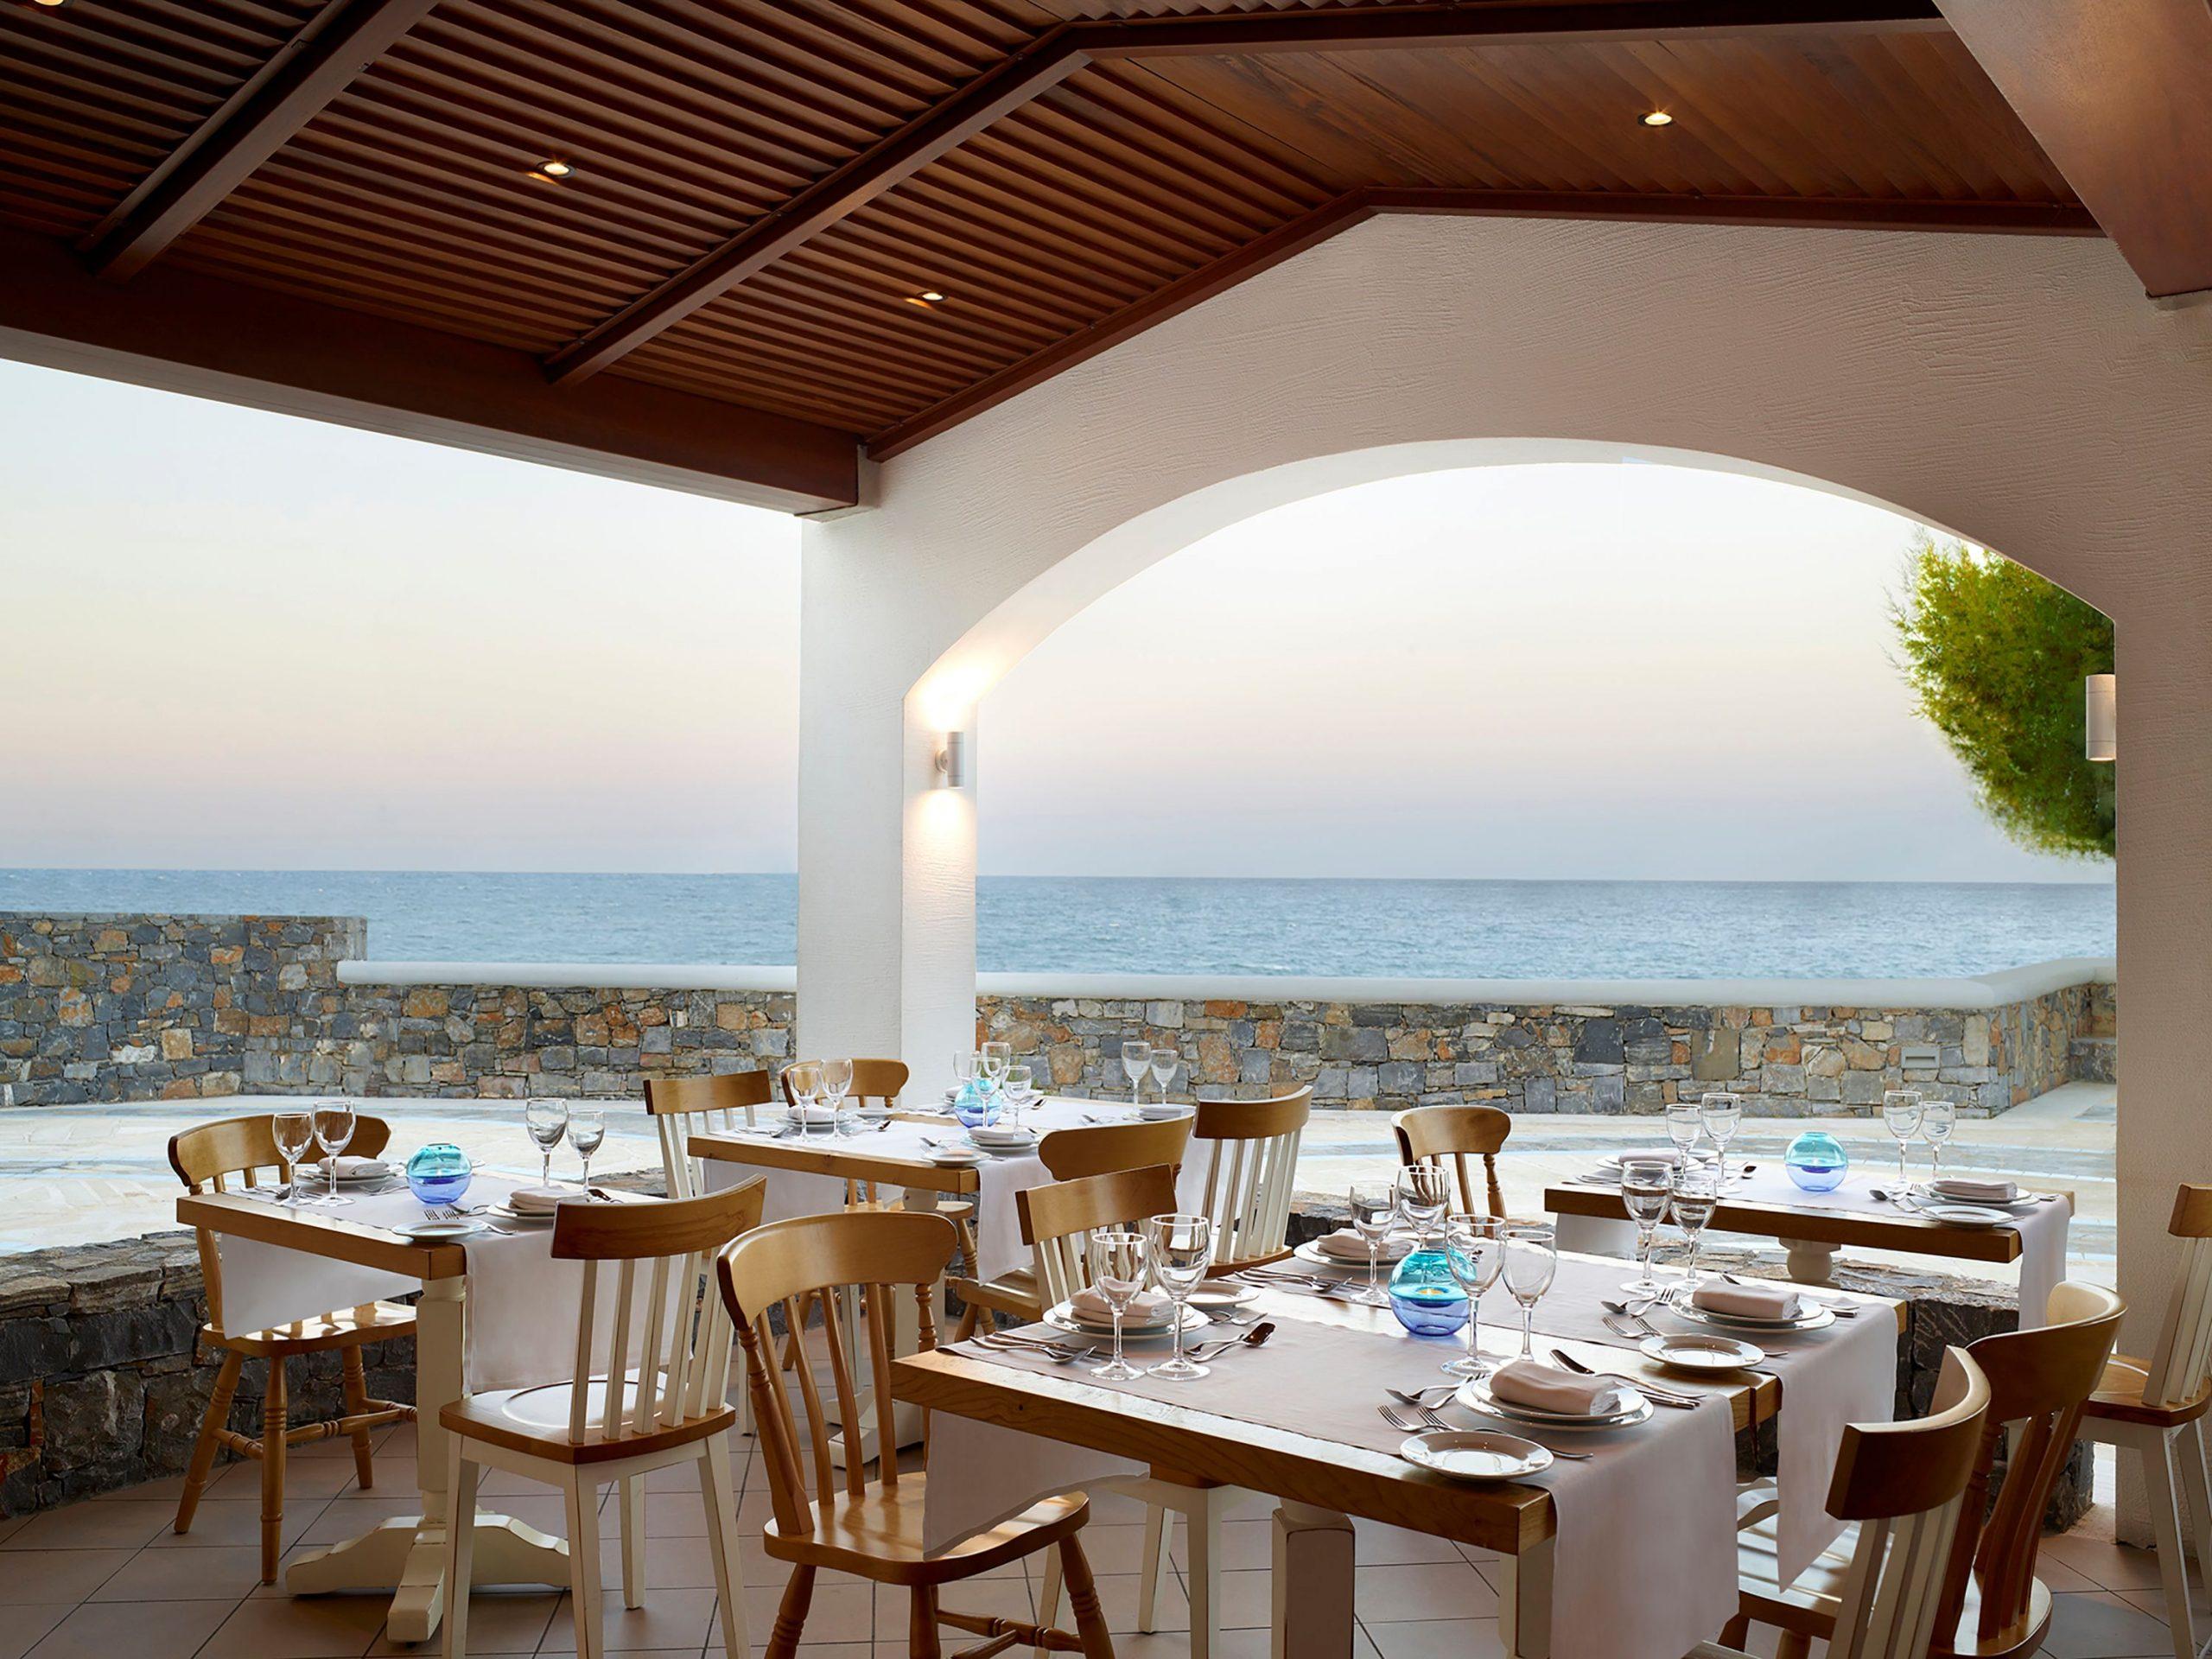 restauracja Almyra, hotel Creta Maris, Kreta